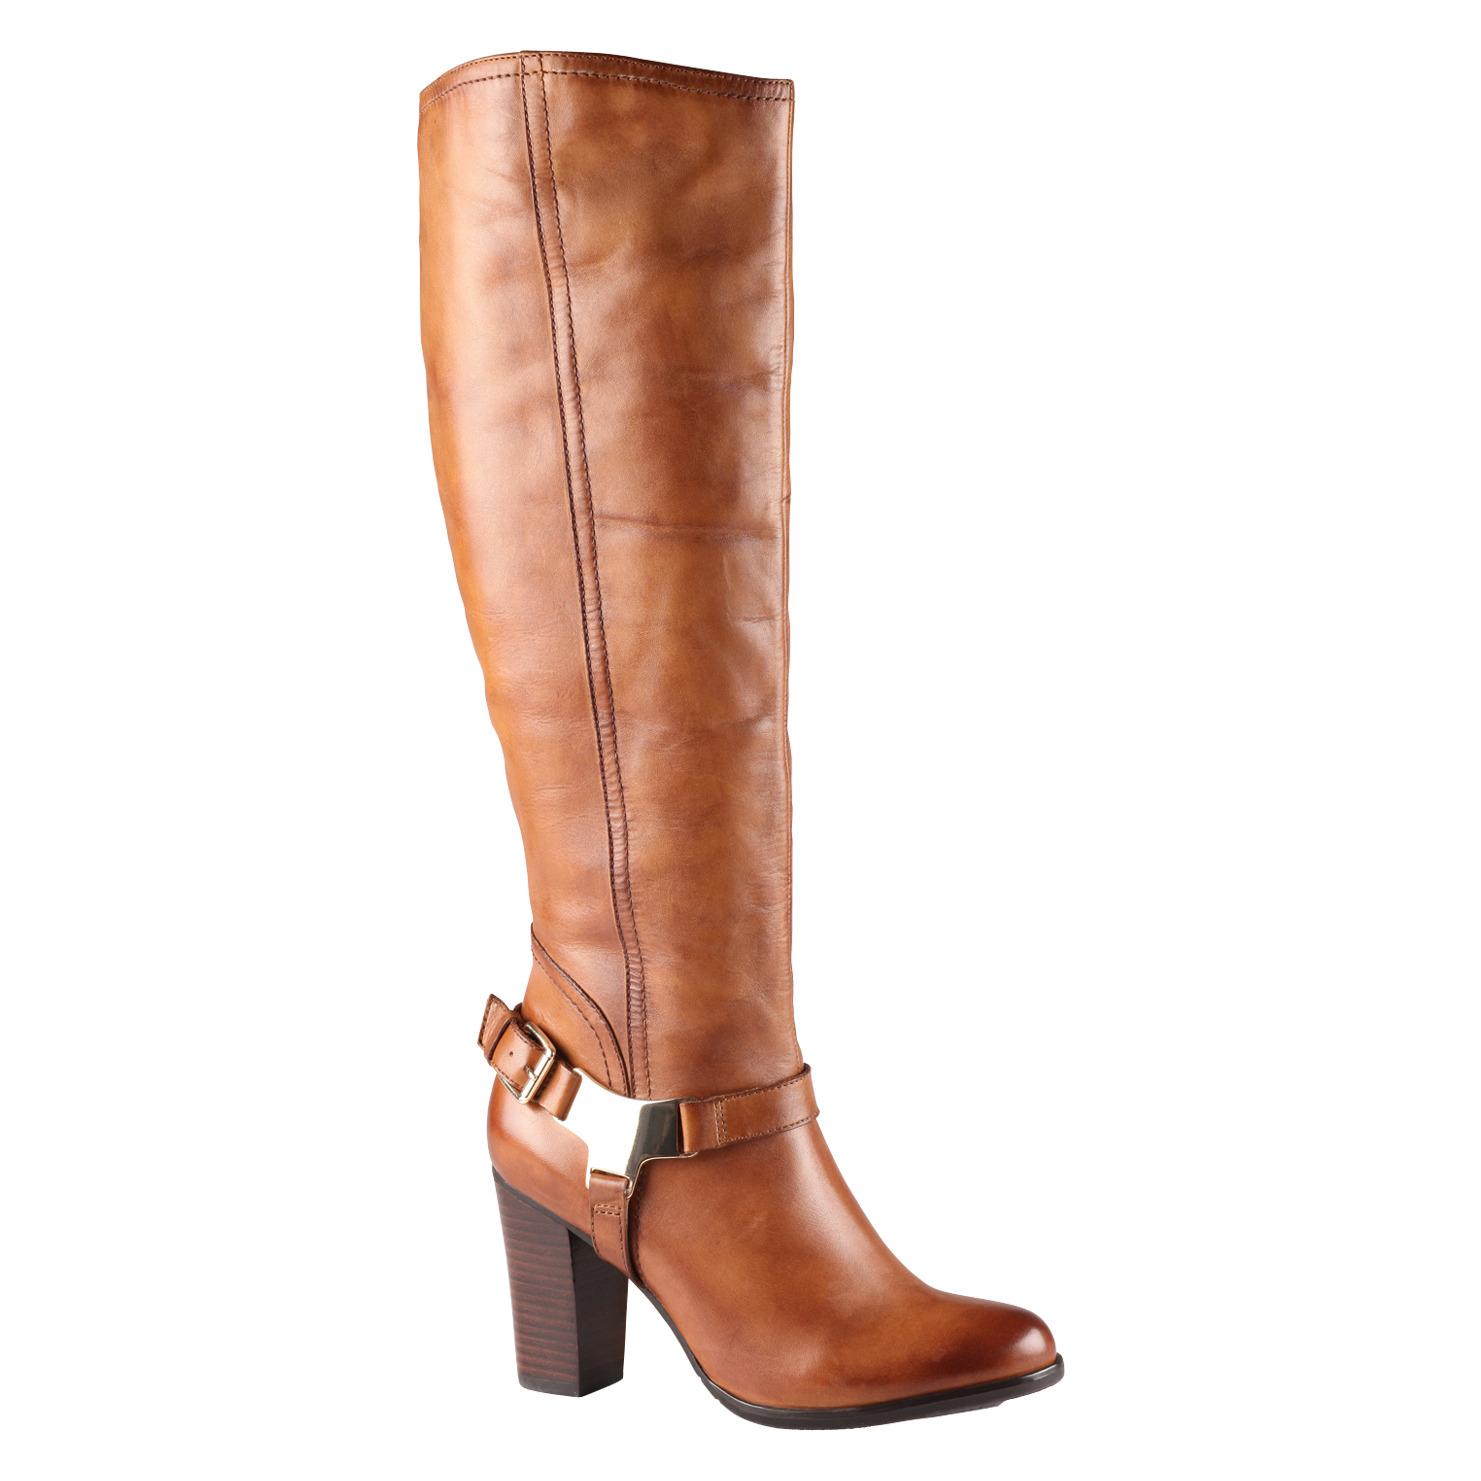 Online Shopping For Aldo Shoes